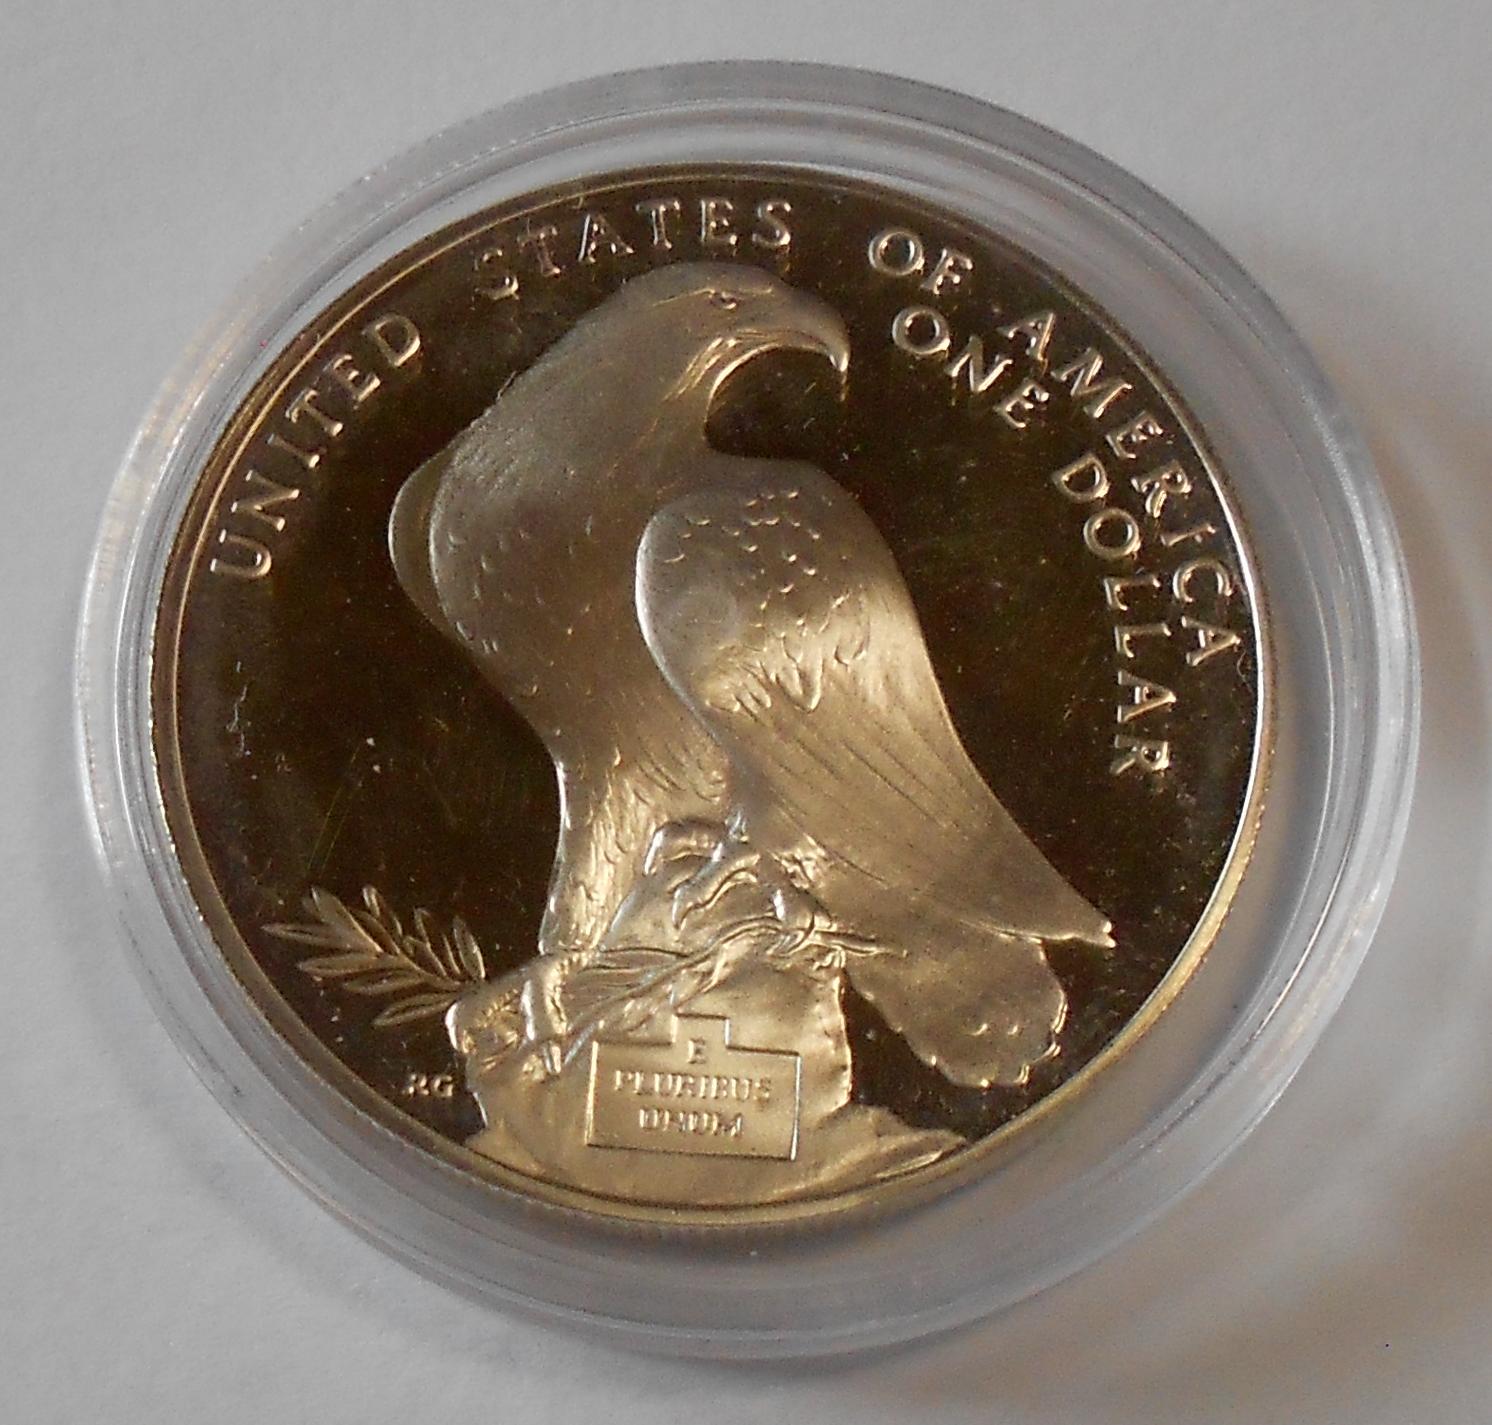 USA 1 Dolar – Los Angeles 1984